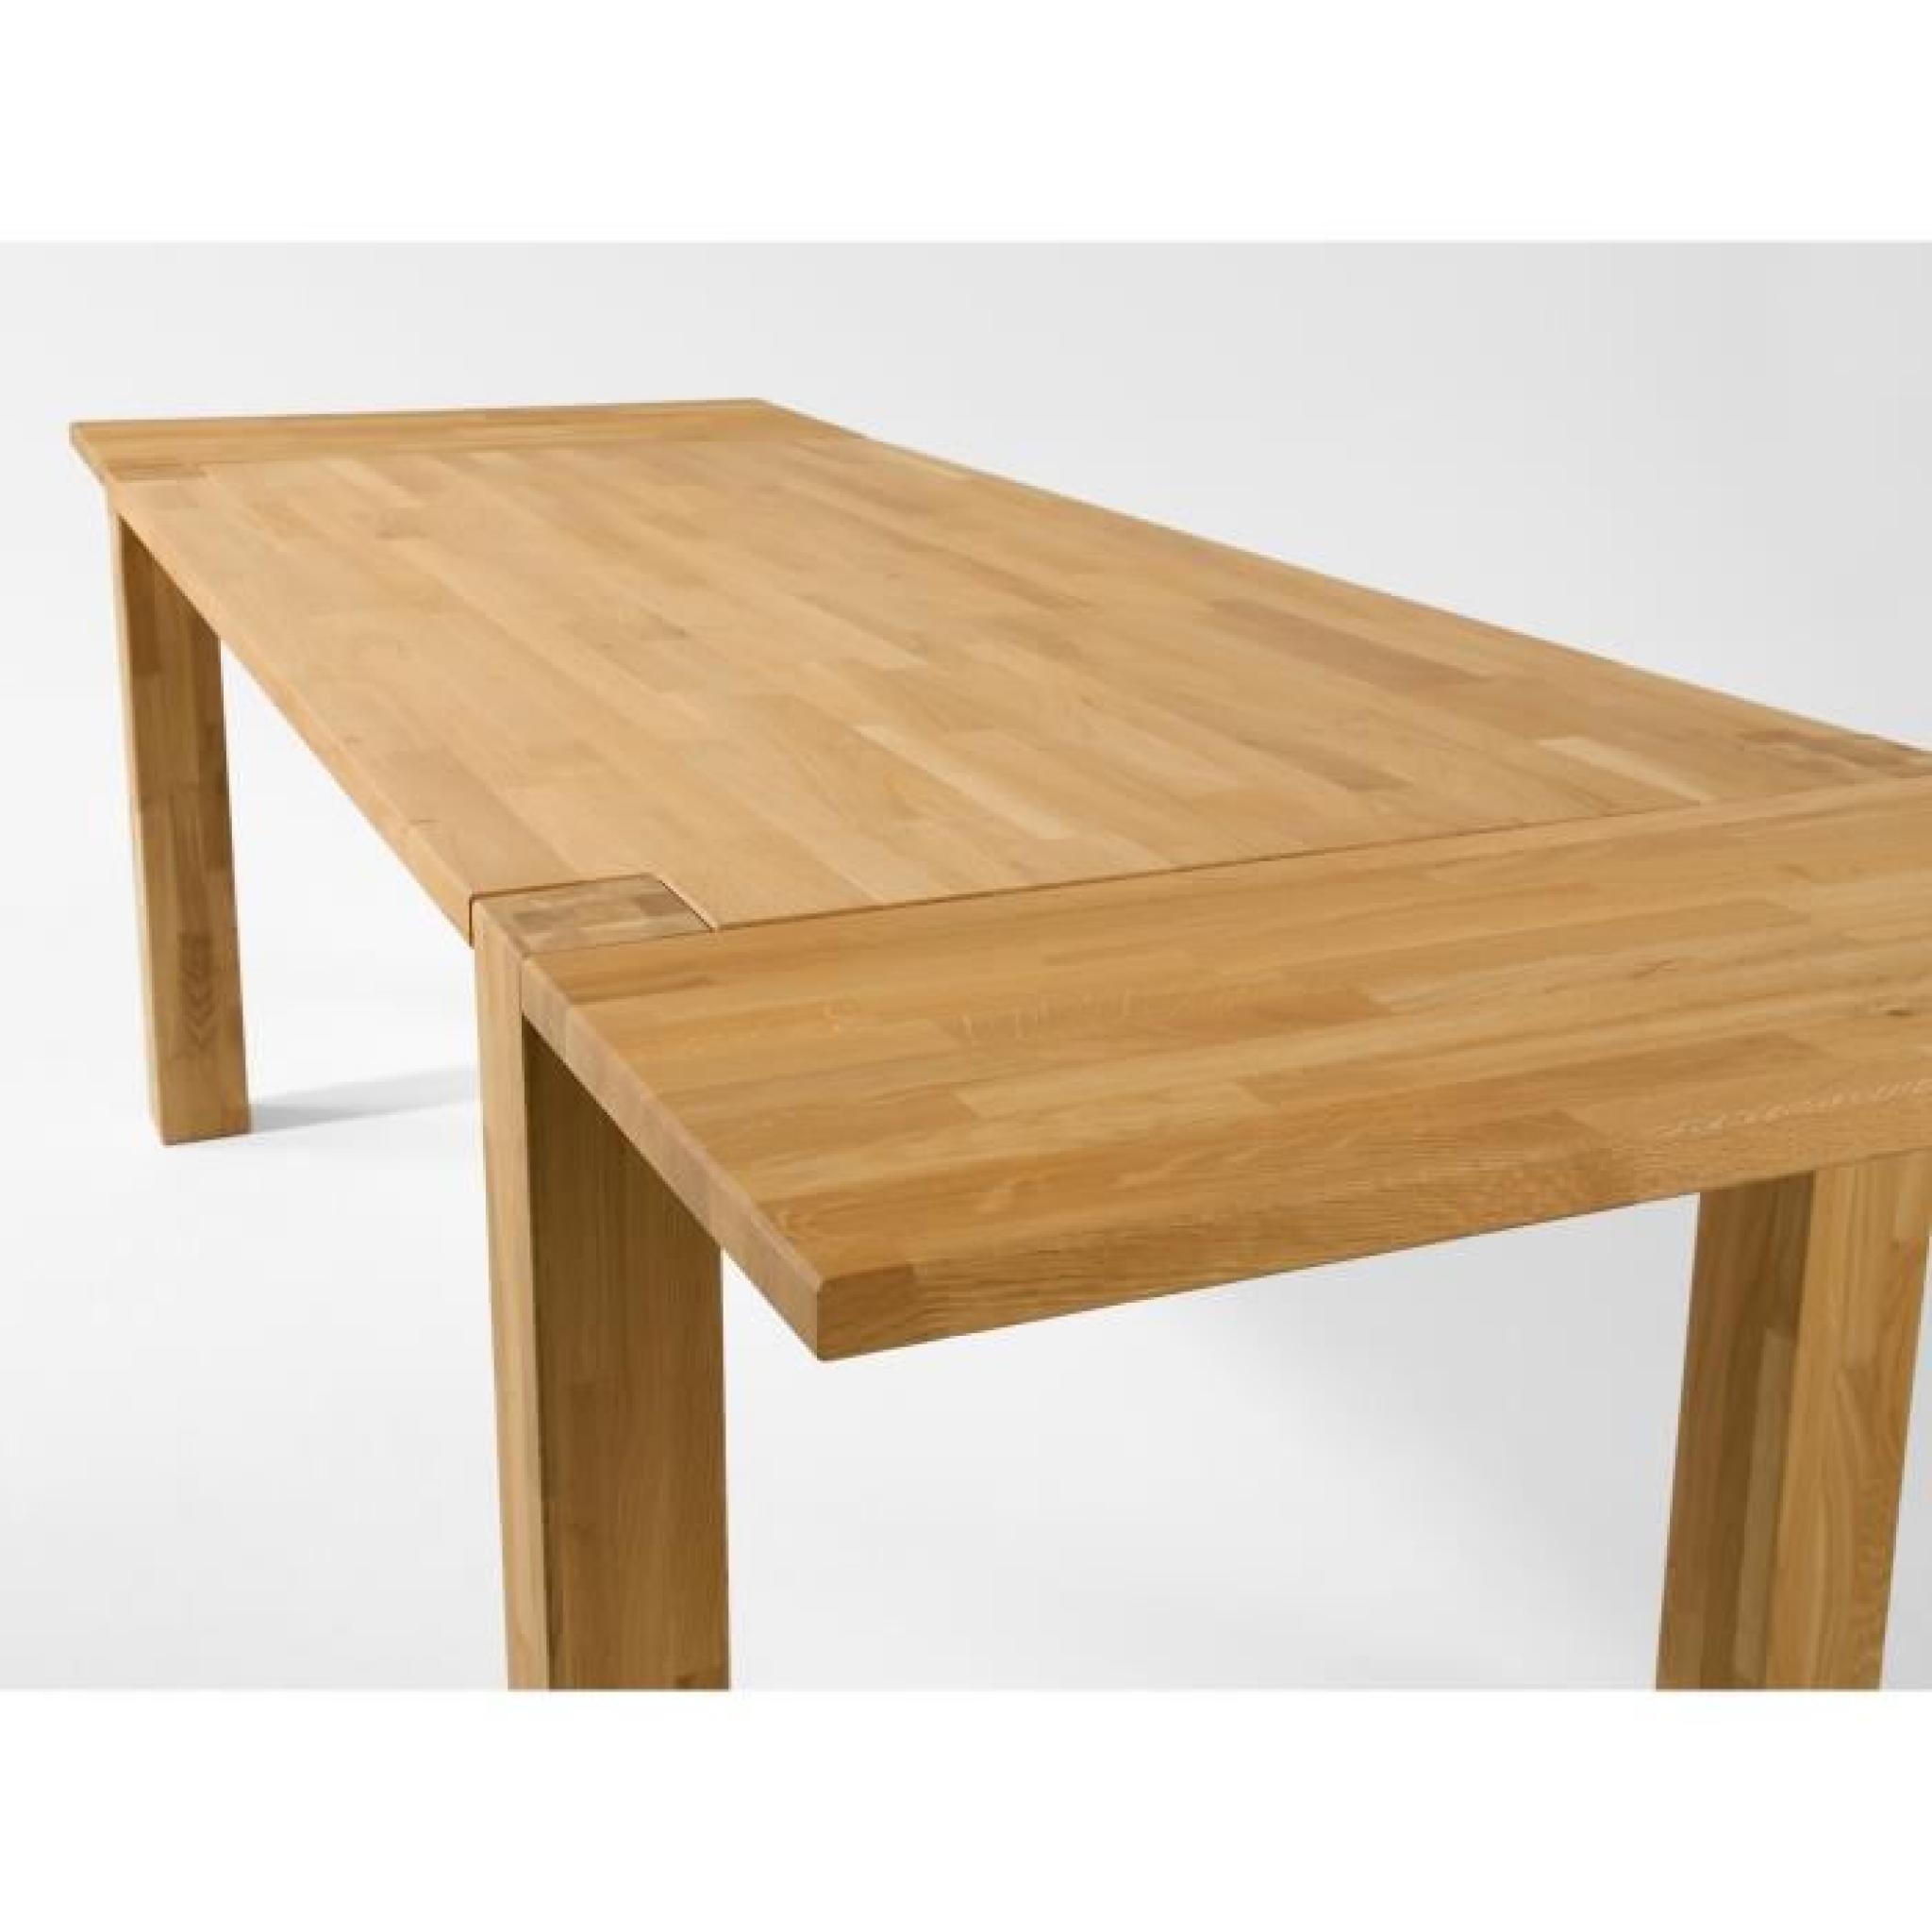 Table wildeiche ii 140x90 avec rallonges en ch ne huil Table moderne avec rallonge